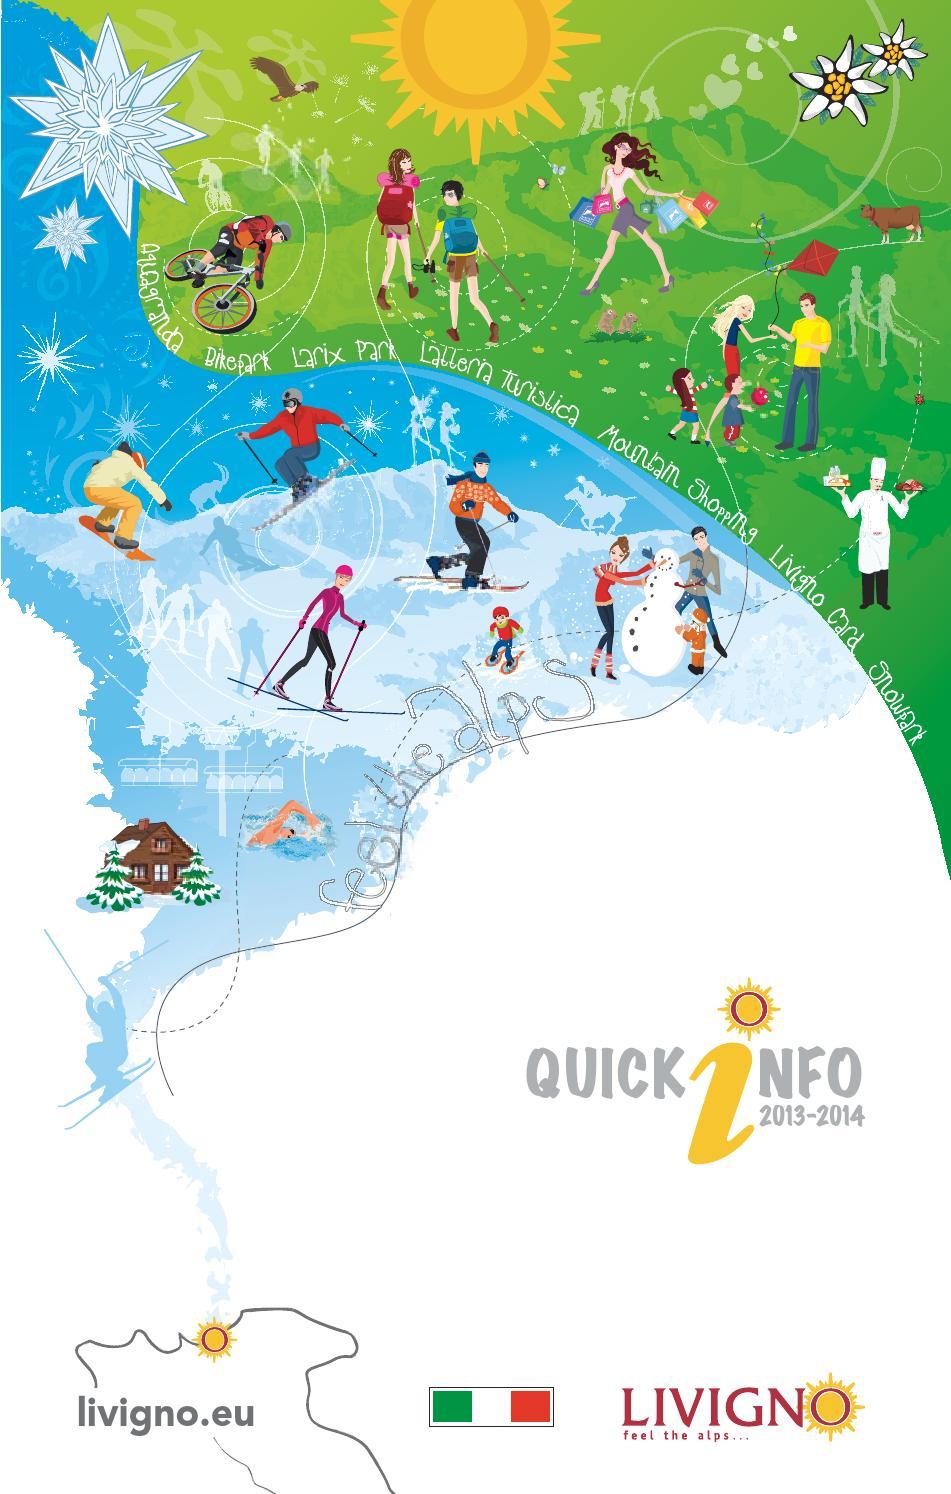 Quick info 2013-2014 italiano by APT Livigno - issuu